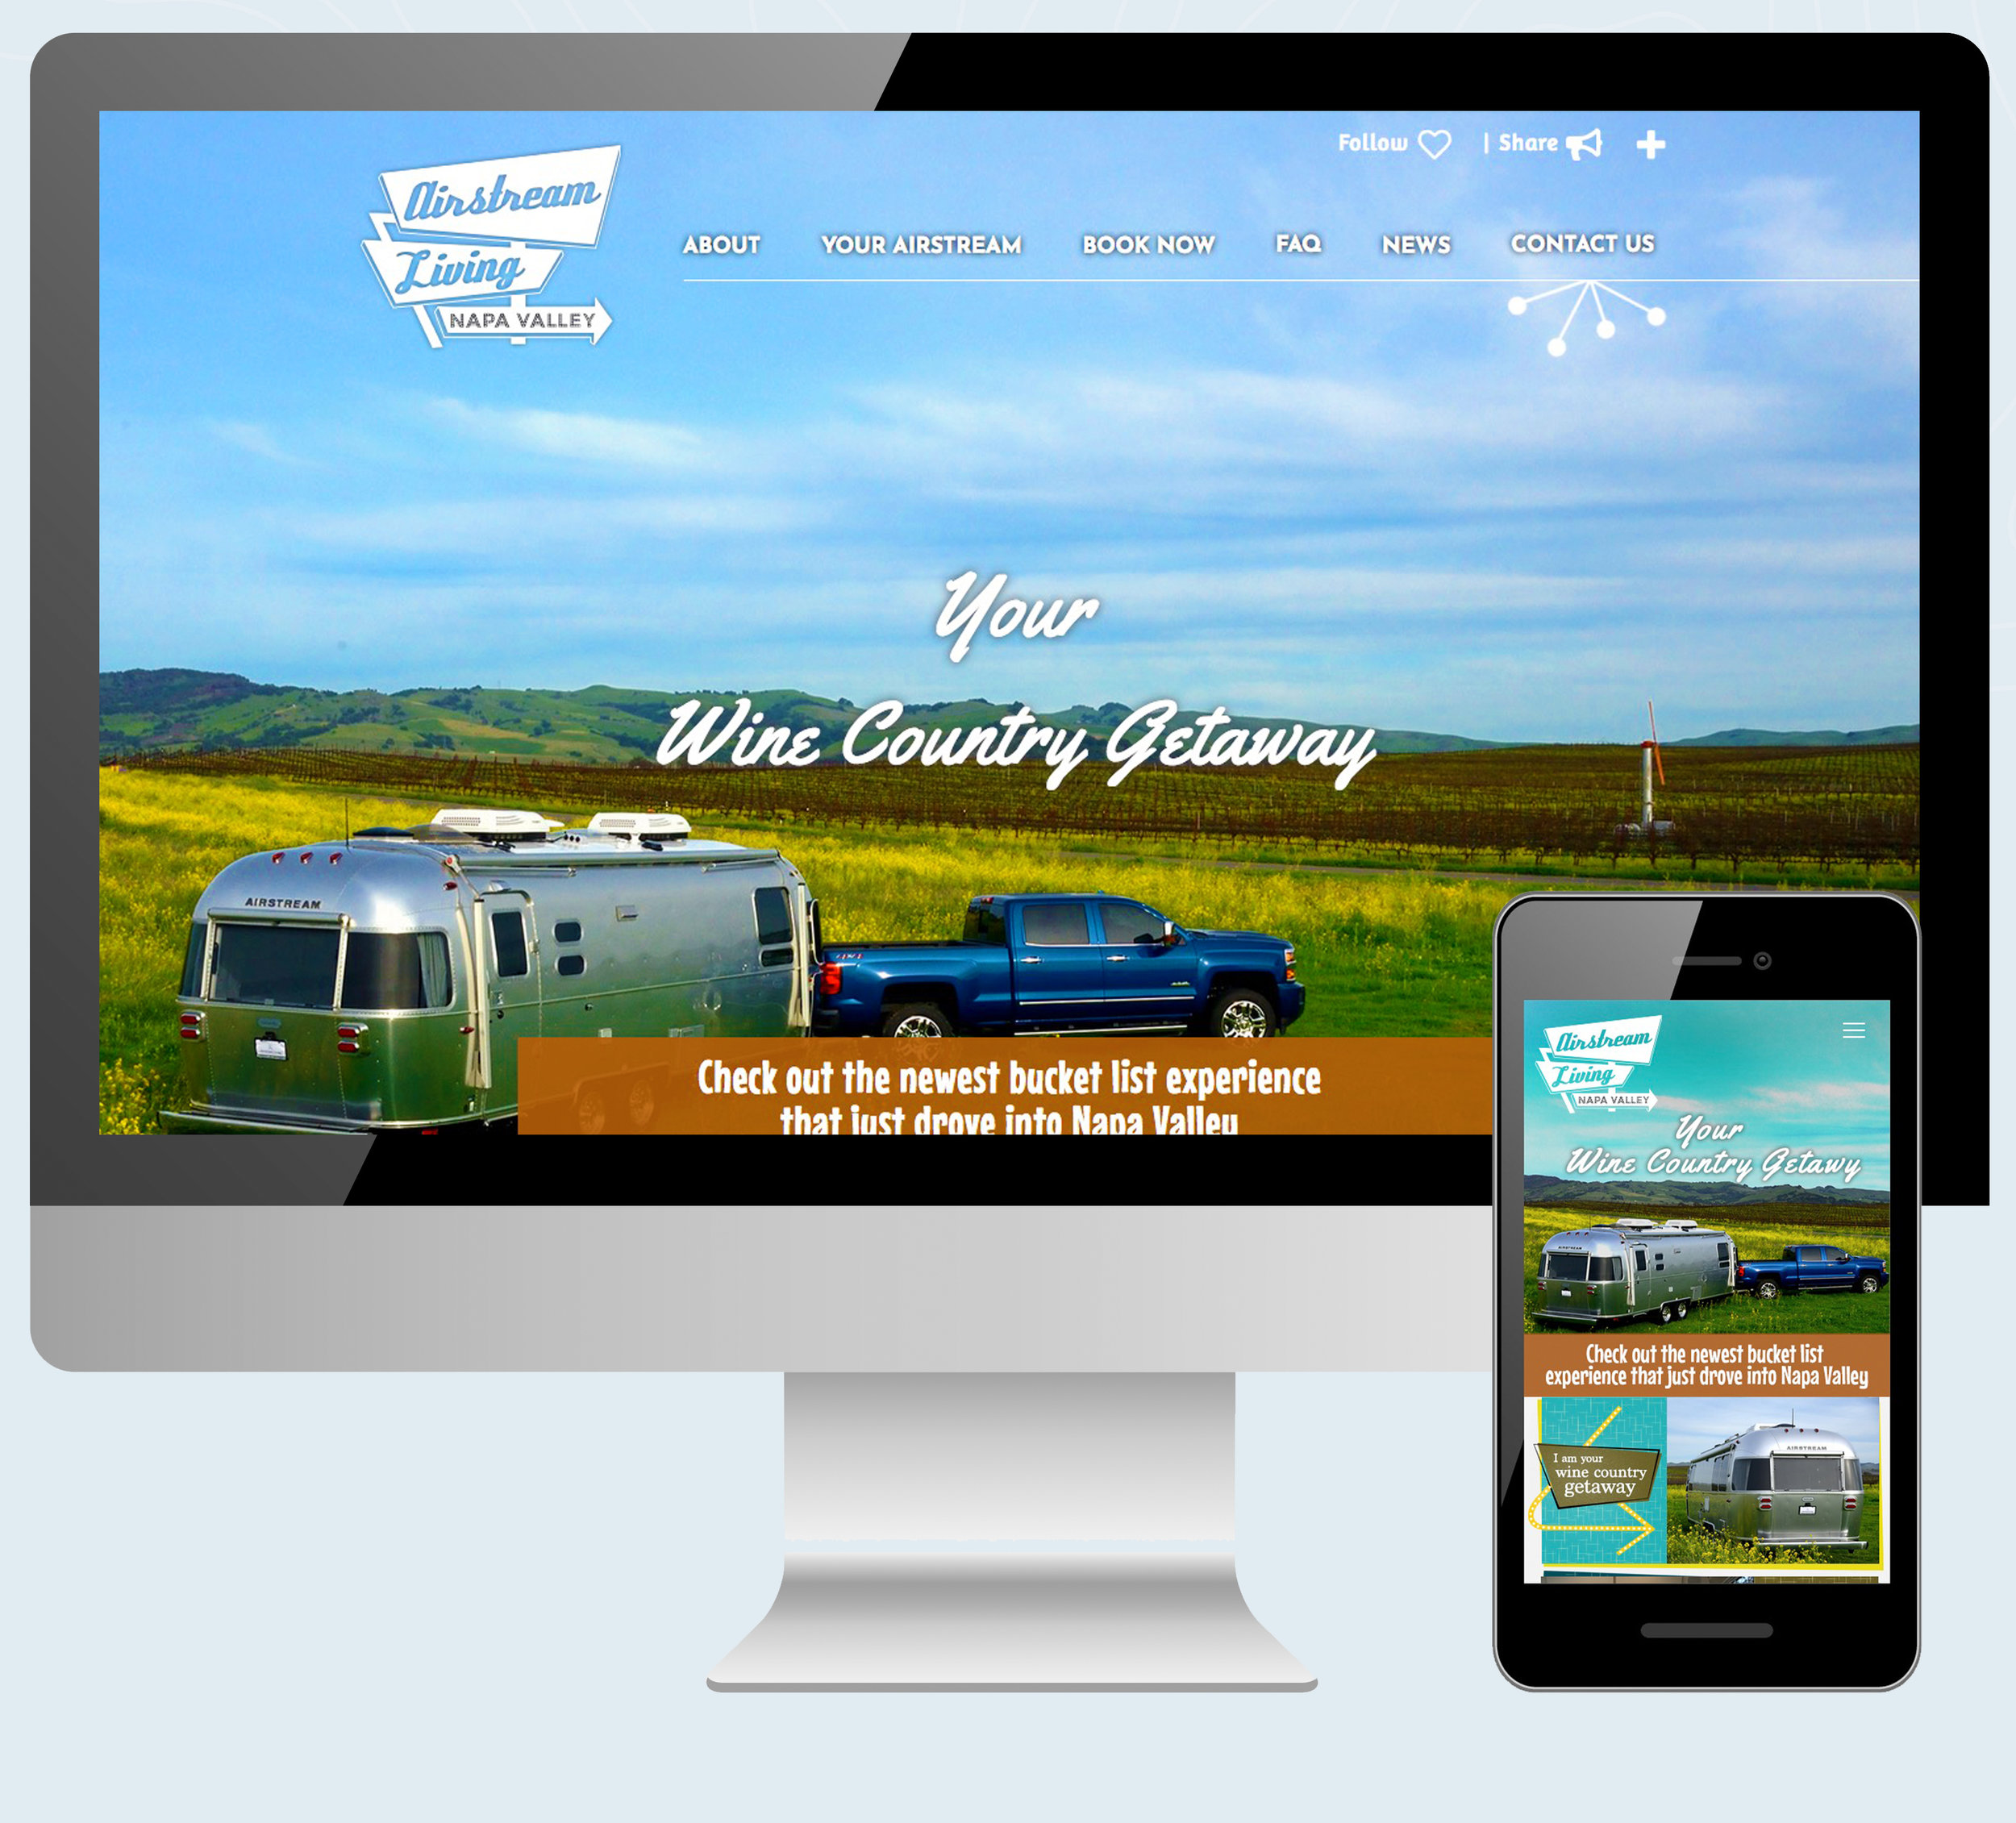 Airstream Napa Valley